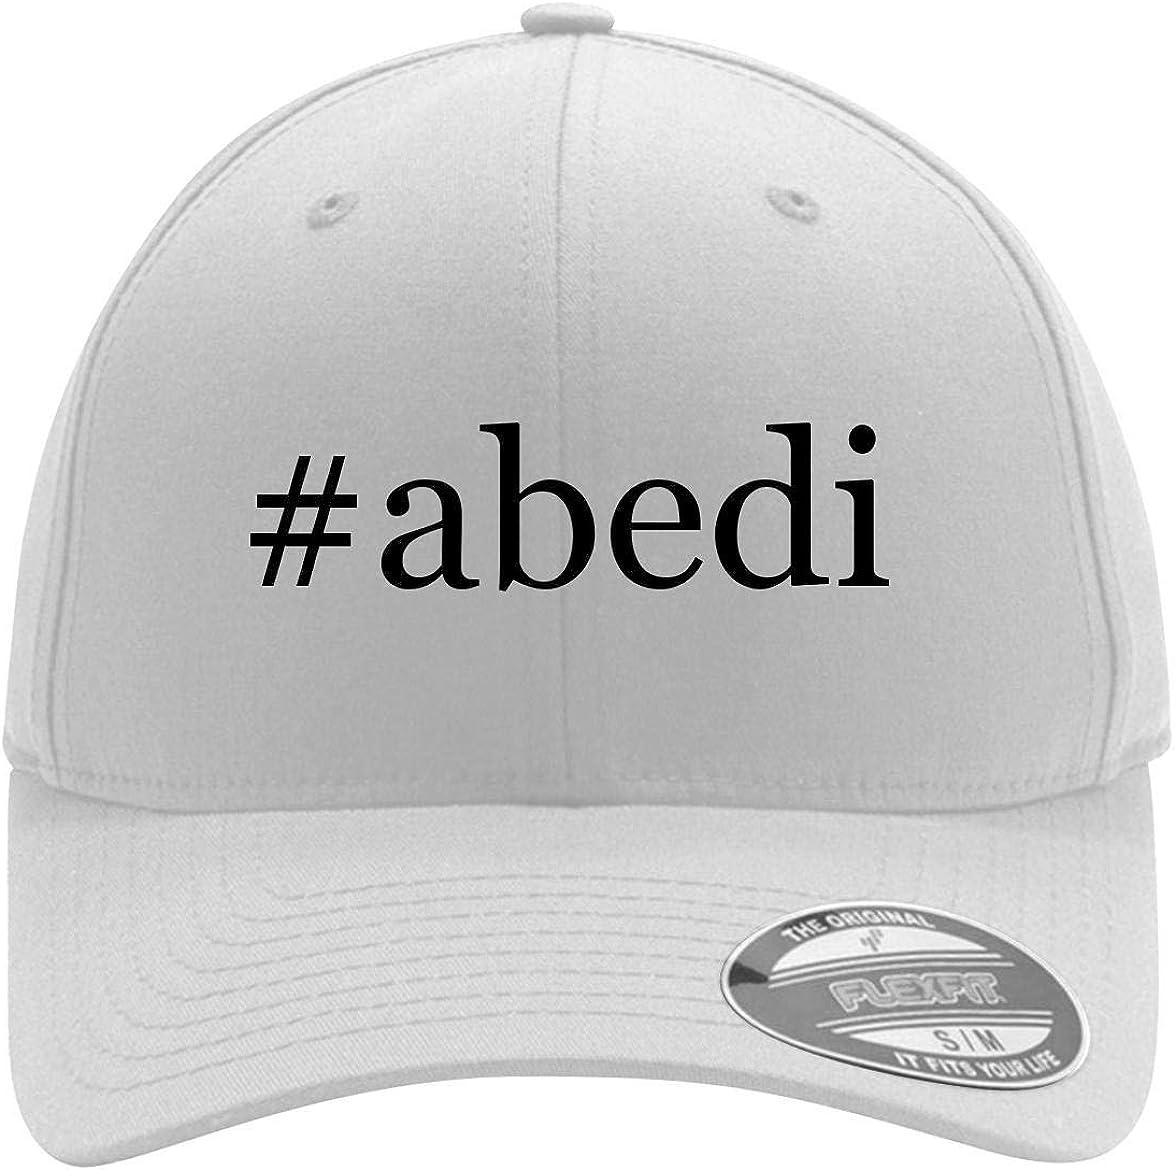 #abedi - Adult Men's Hashtag Flexfit Baseball Hat Cap 61HVIEd-eTL